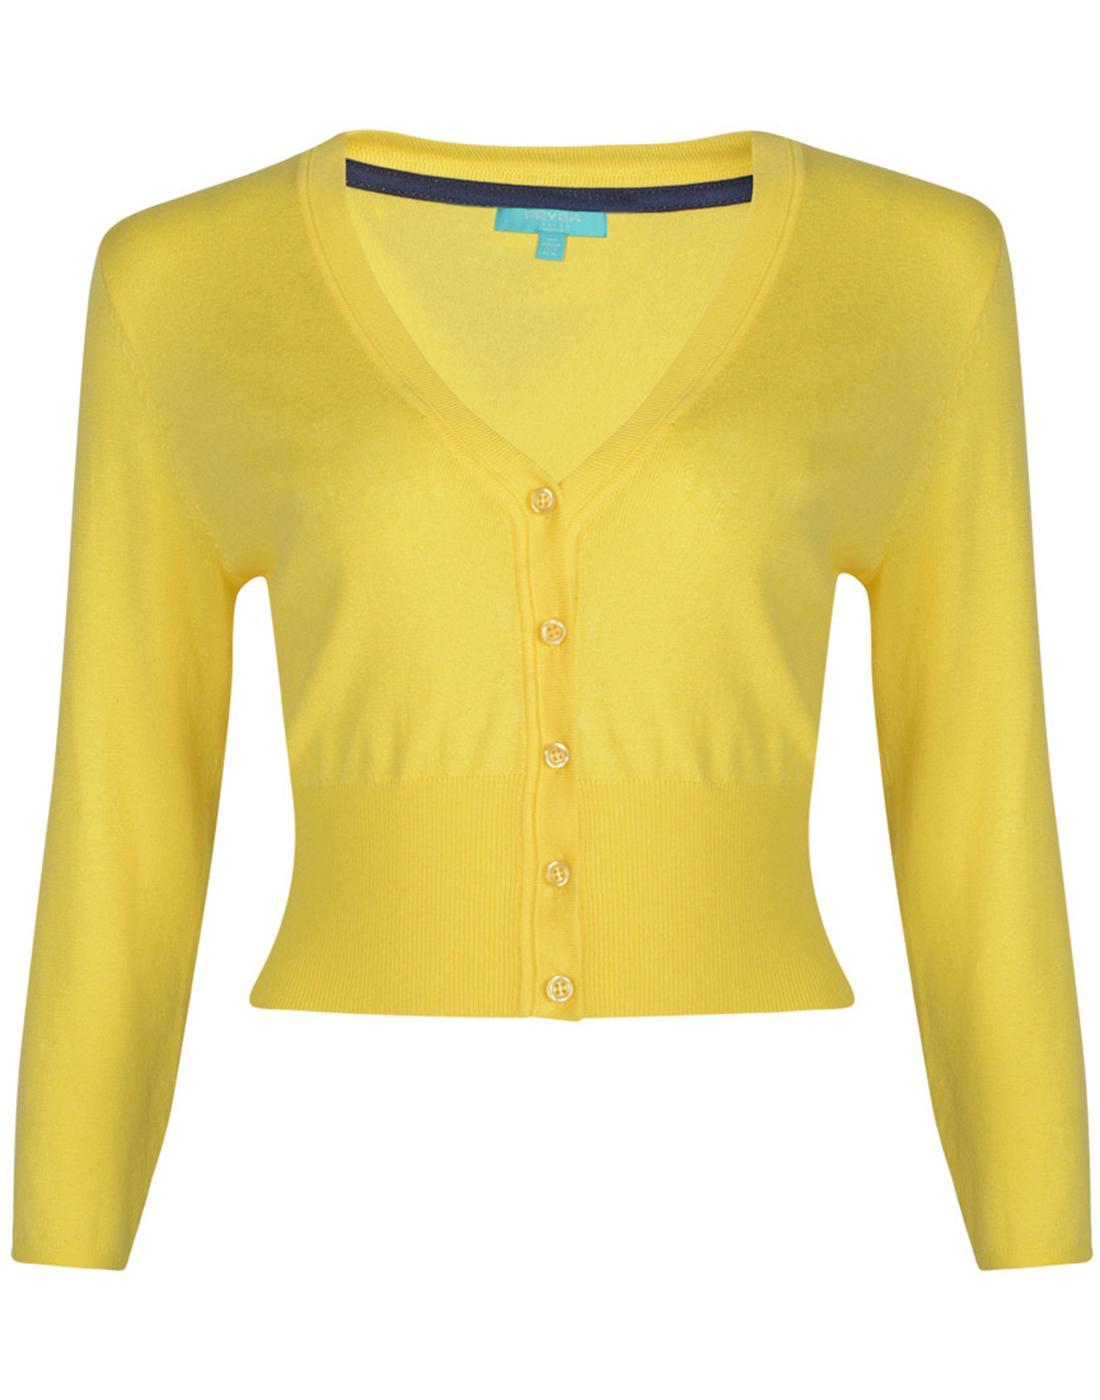 Mariel FEVER Retro Vintage Cropped Cardigan Yellow